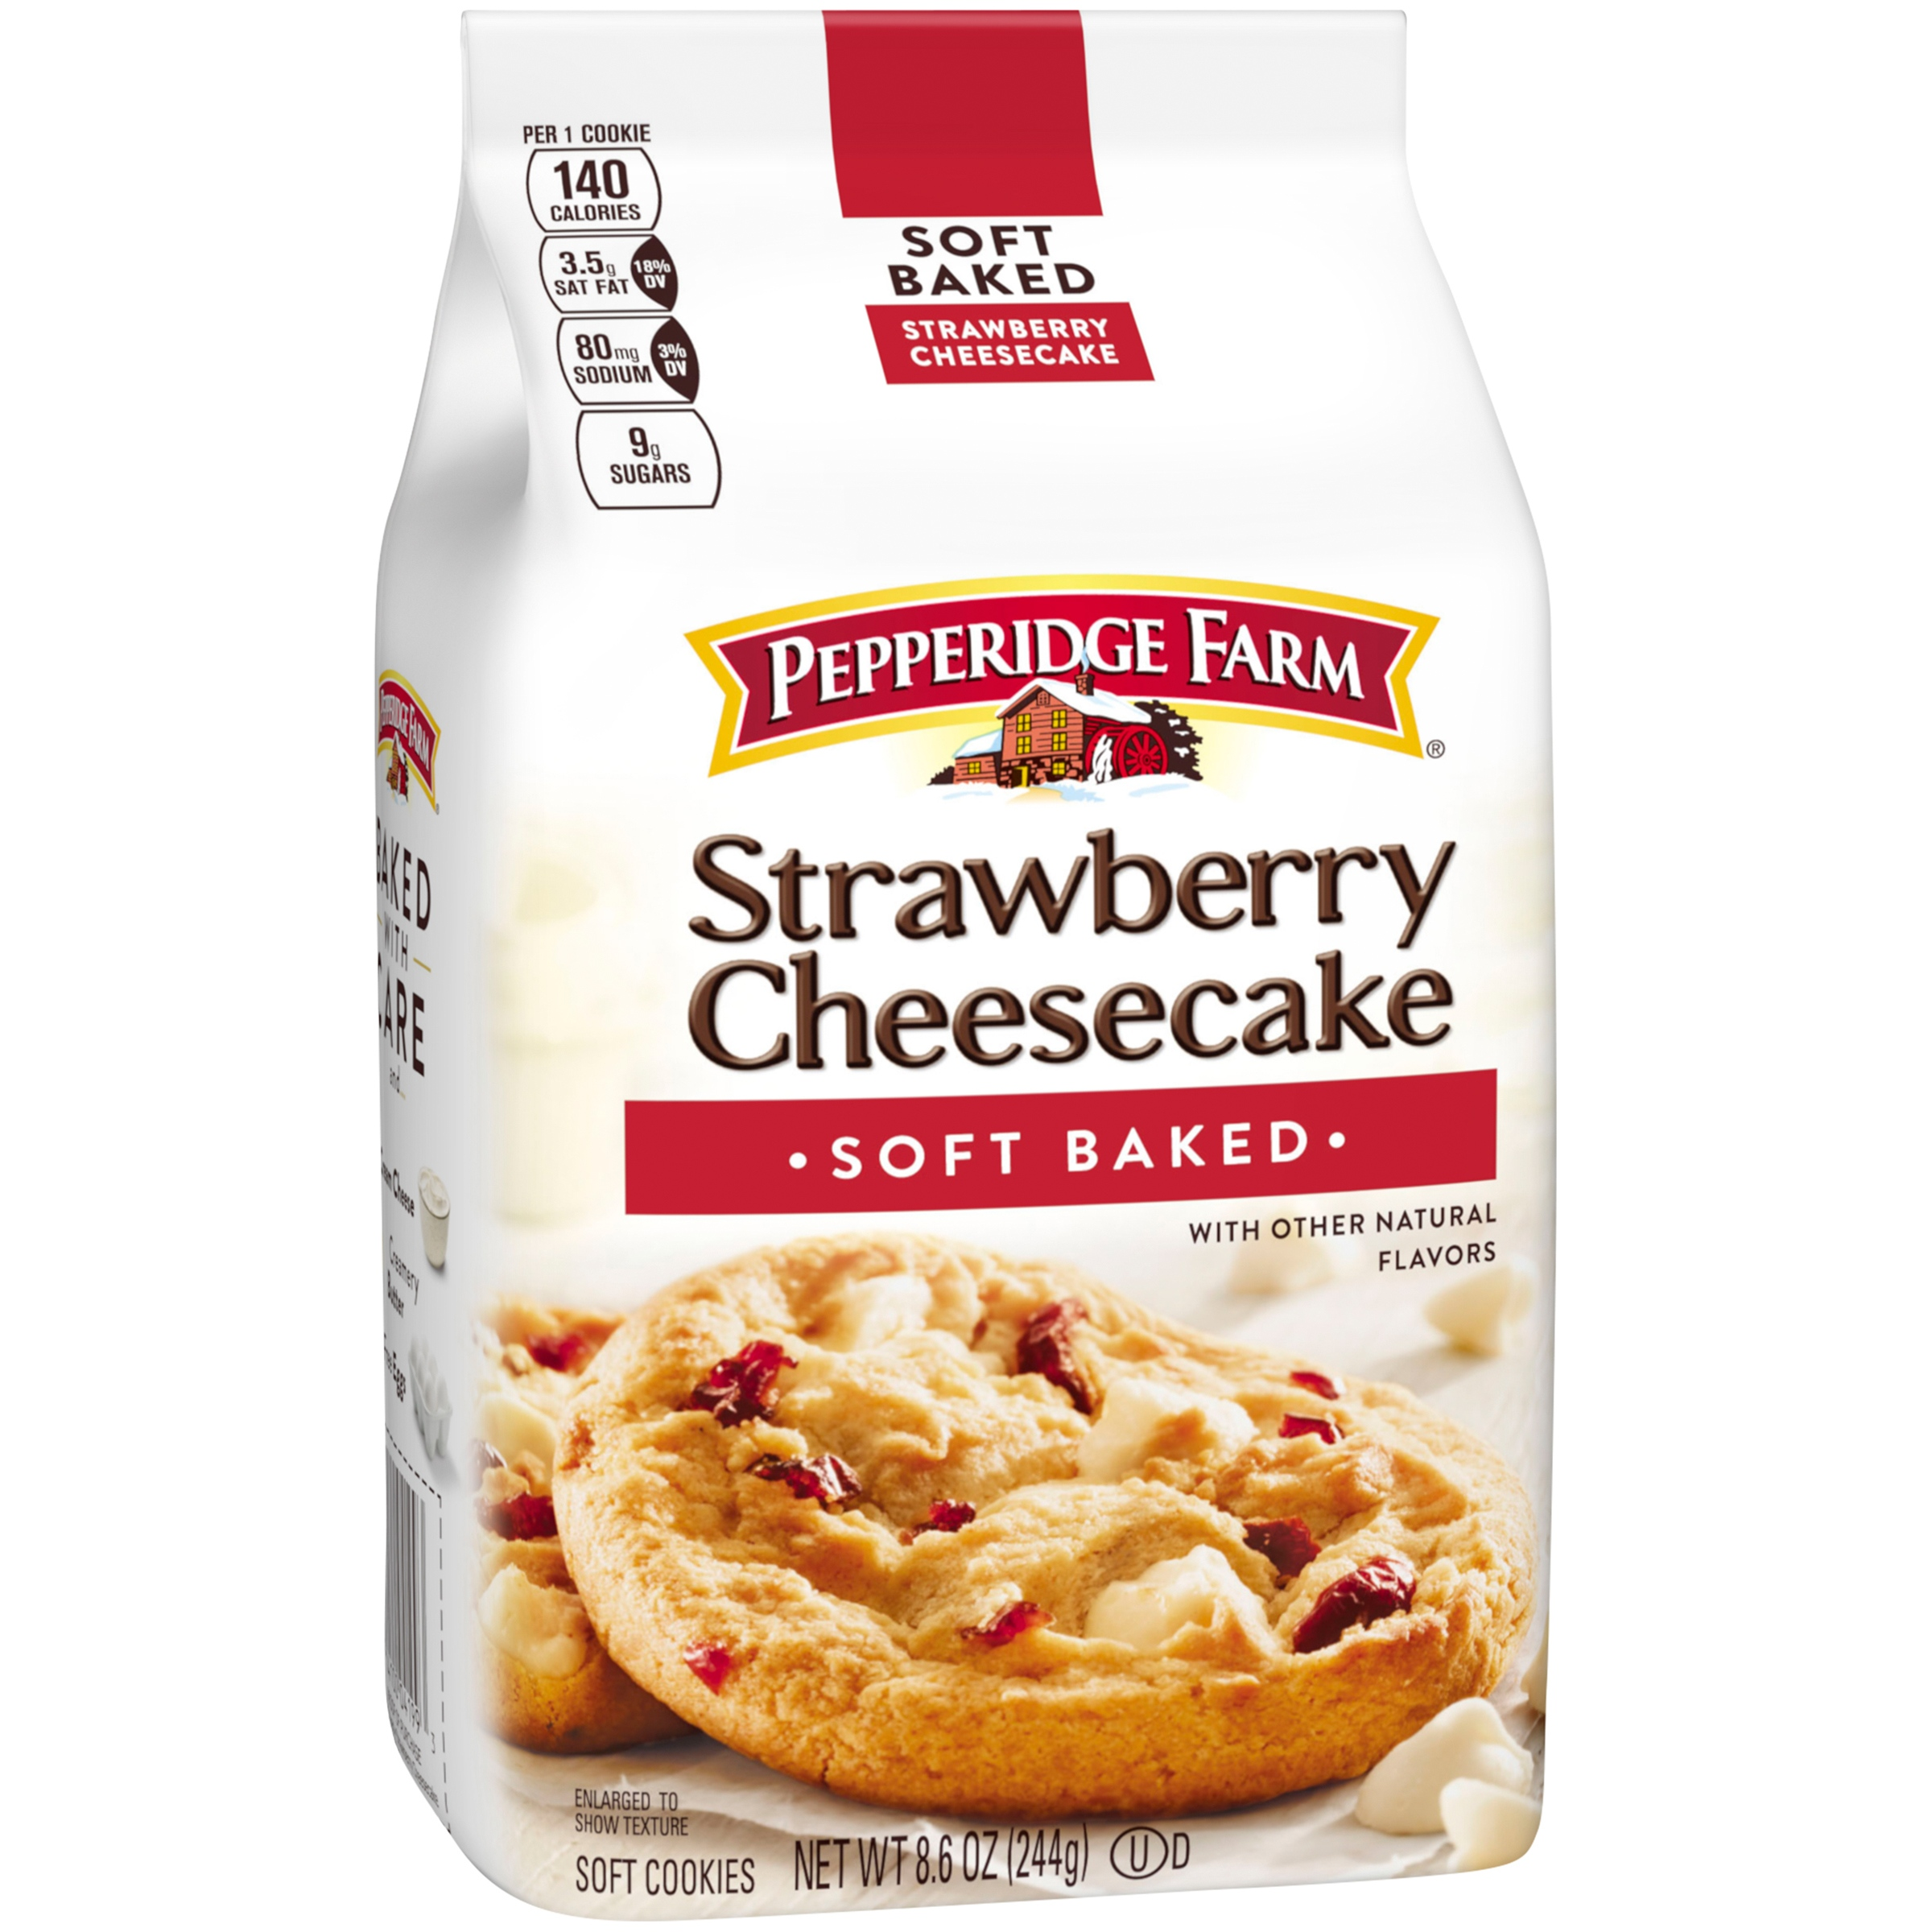 Pepperidge Farm Strawberry Cheesecake Soft Baked Cookies 8.6 oz. Stand Up Bag by Pepperidge Farm, Inc.